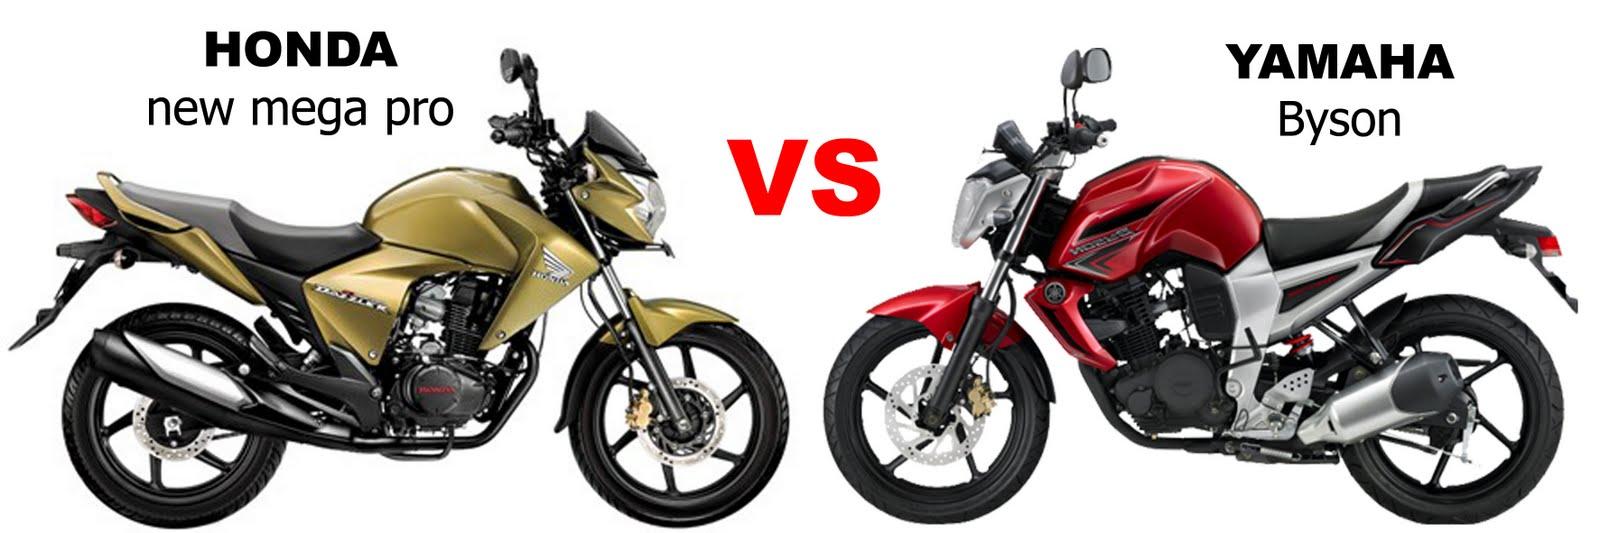 Adu Tangguh Yamaha Byson Vs Honda New Megapro